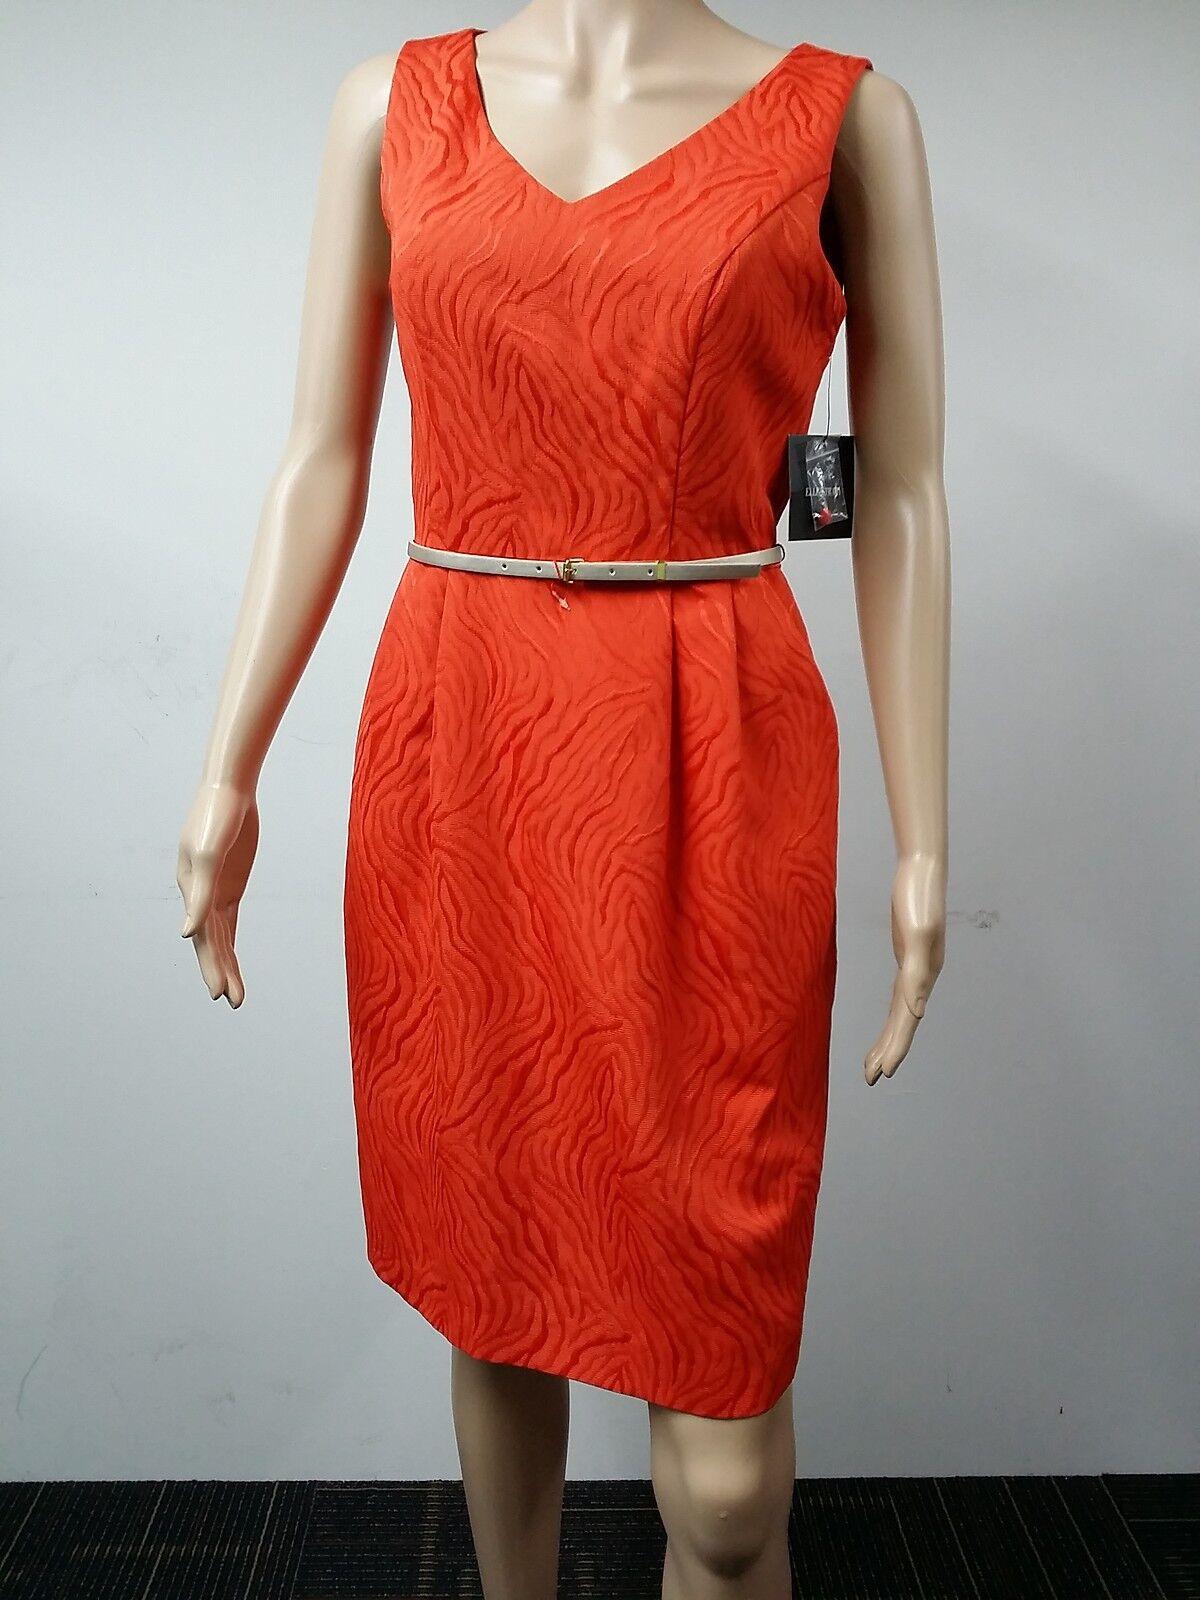 nouveau - Ellen Tracy - Taille 6 - Sleeveless Texturouge Belted Robe - Orange -  128